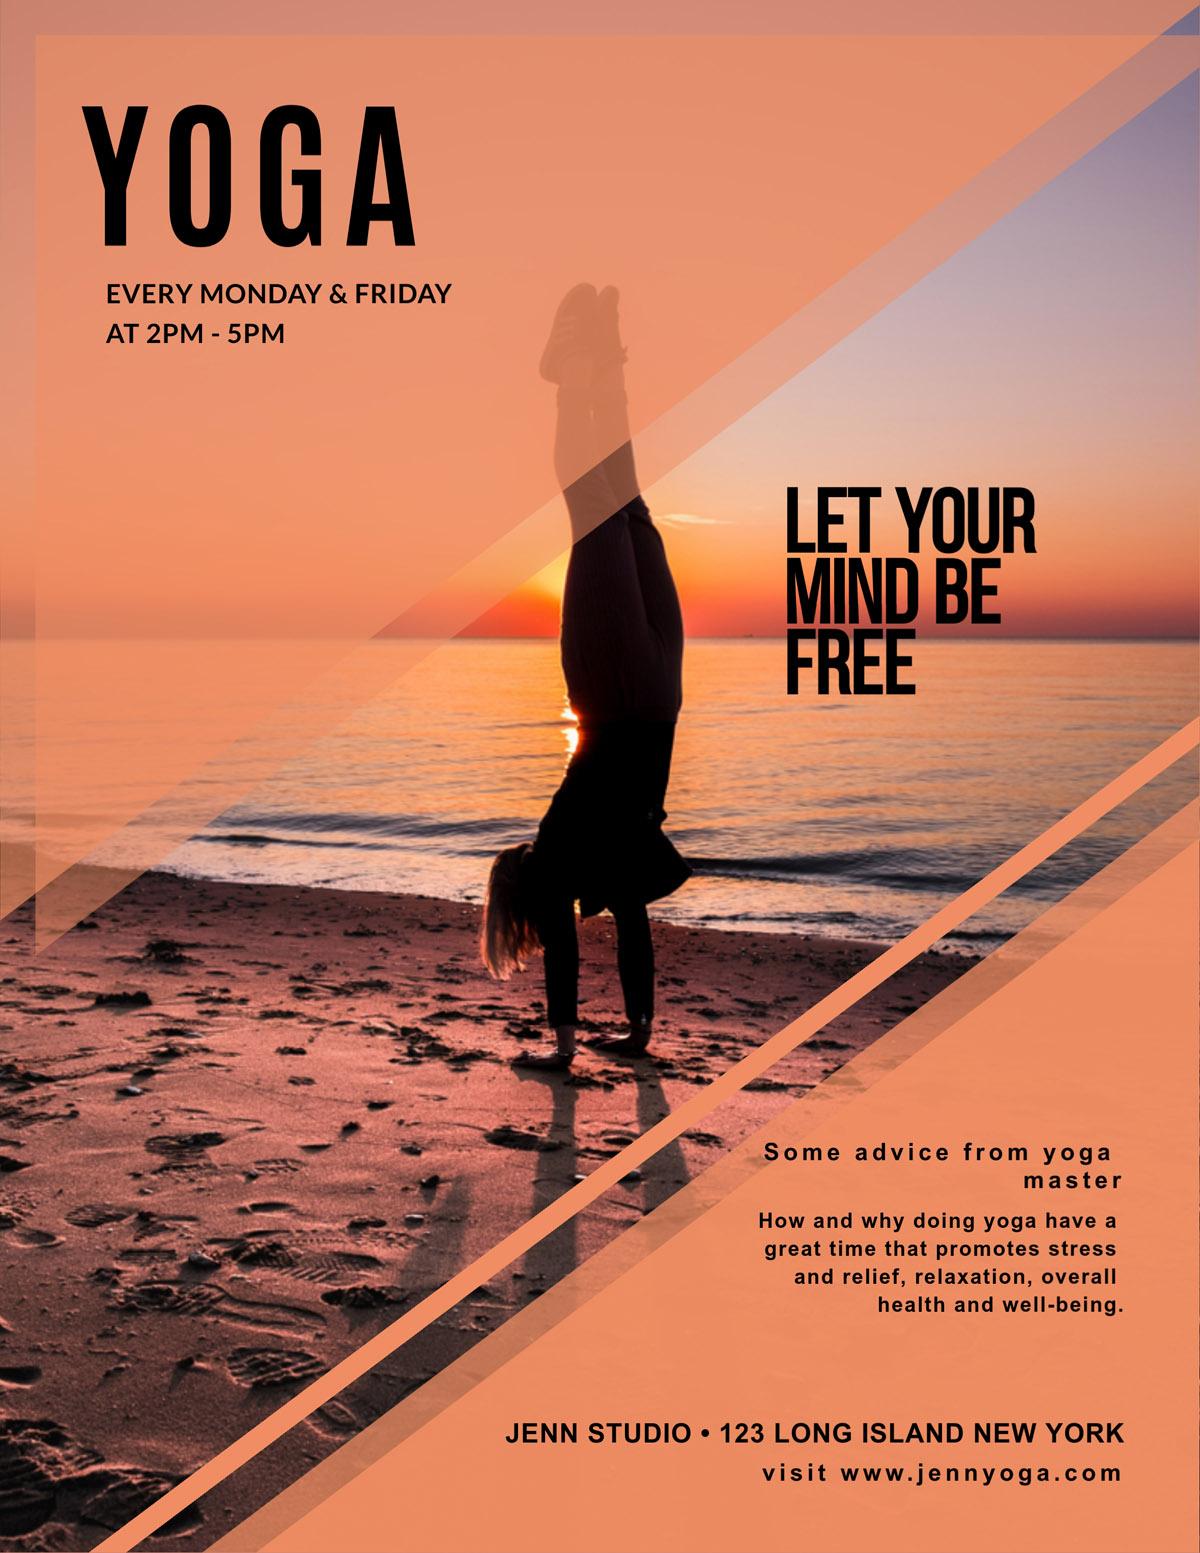 flyer templates - yoga fitness